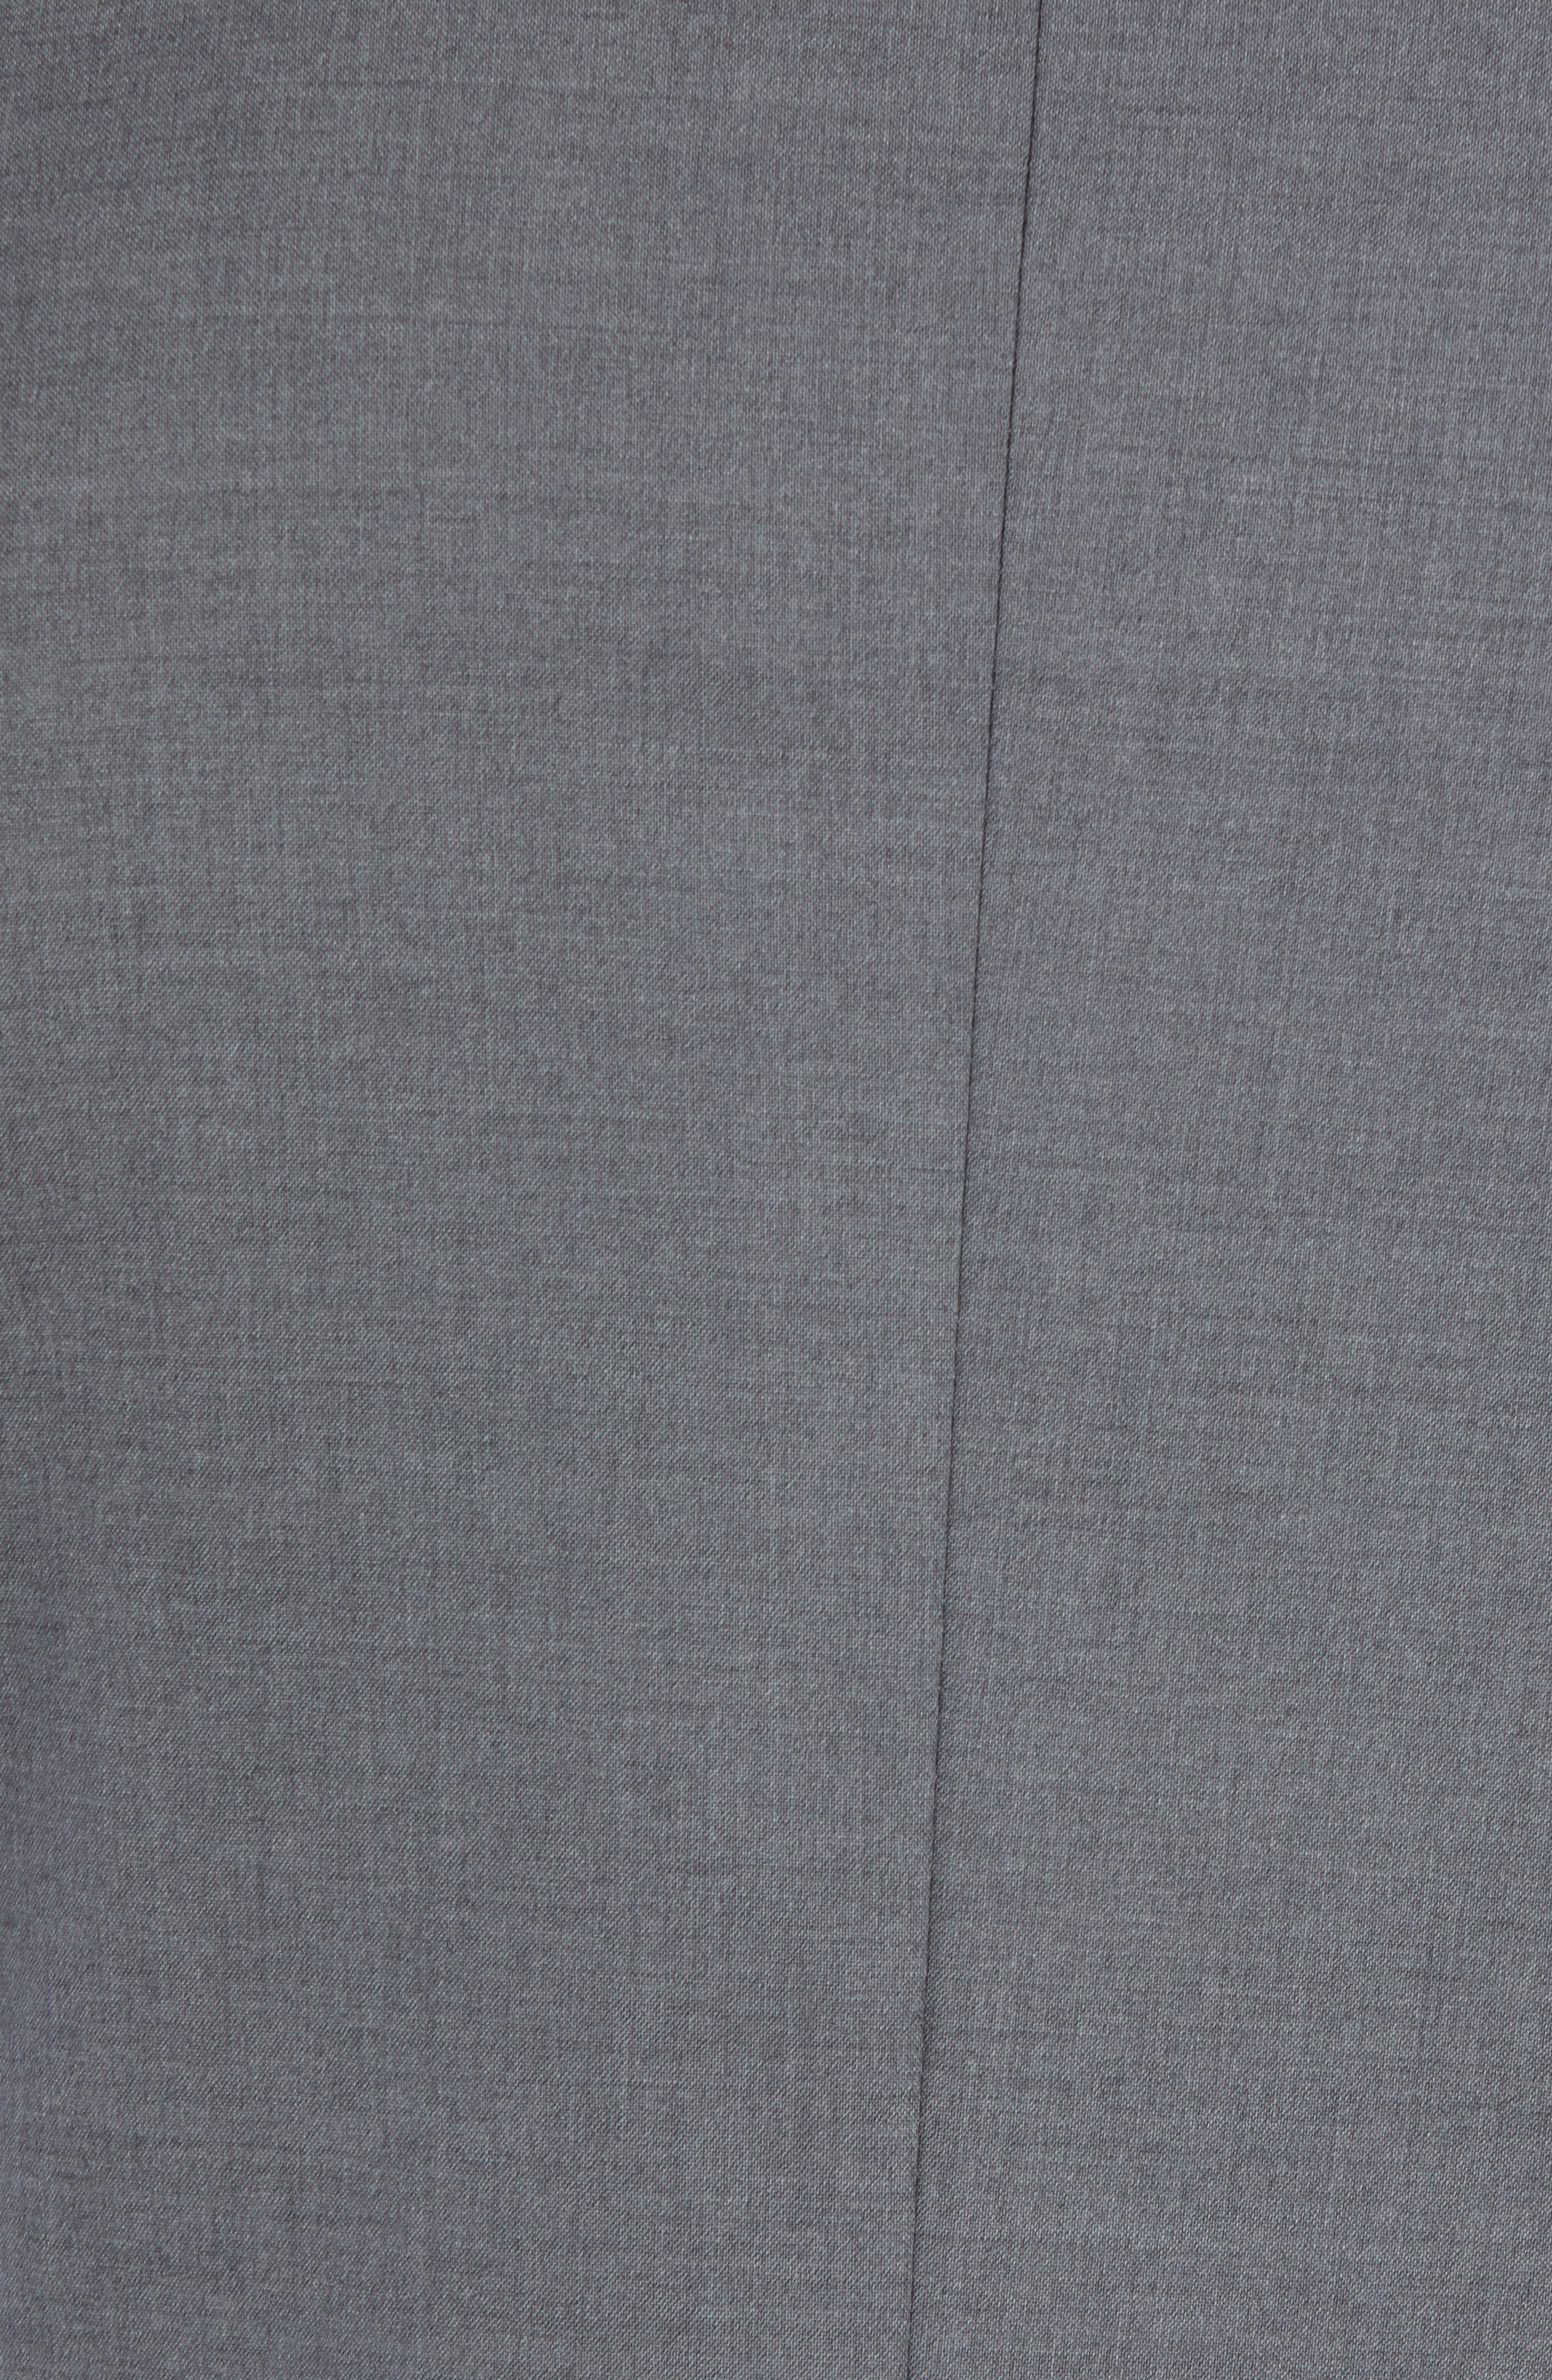 NORDSTROM MEN'S SHOP,                             Tech-Smart Trim Fit Stretch Wool Travel Sport Coat,                             Alternate thumbnail 5, color,                             GREY